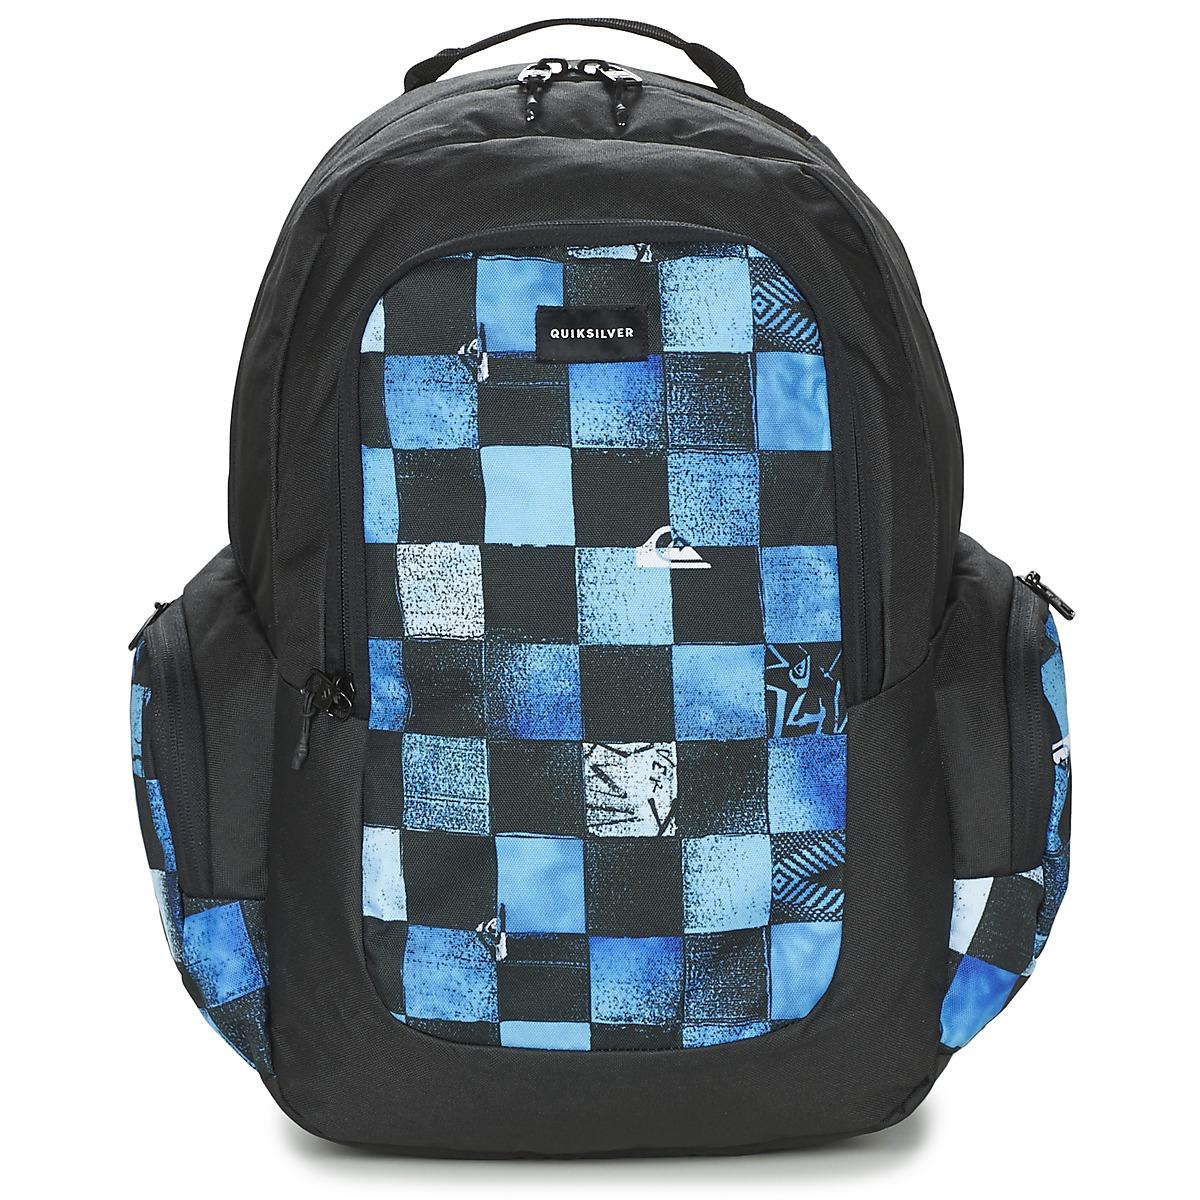 Quiksilver SCHOOLIE Noir / Bleu